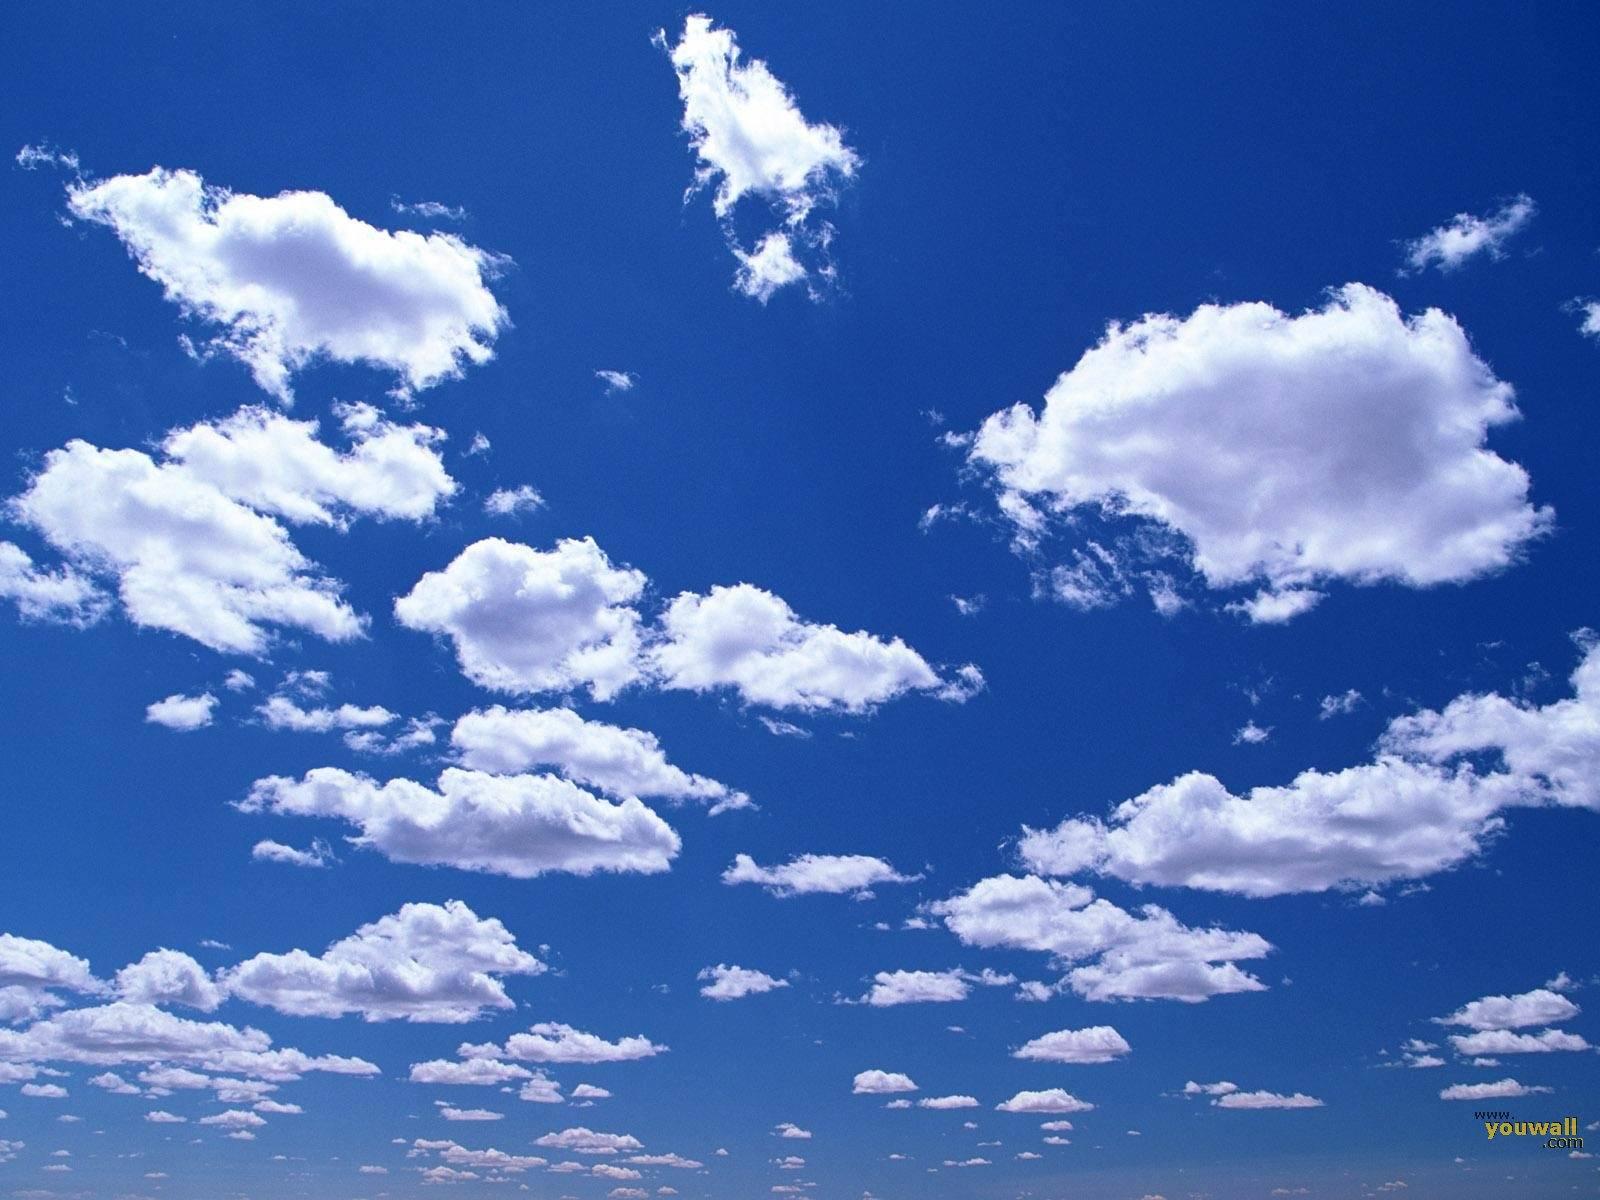 Clouds Wallpaper 029